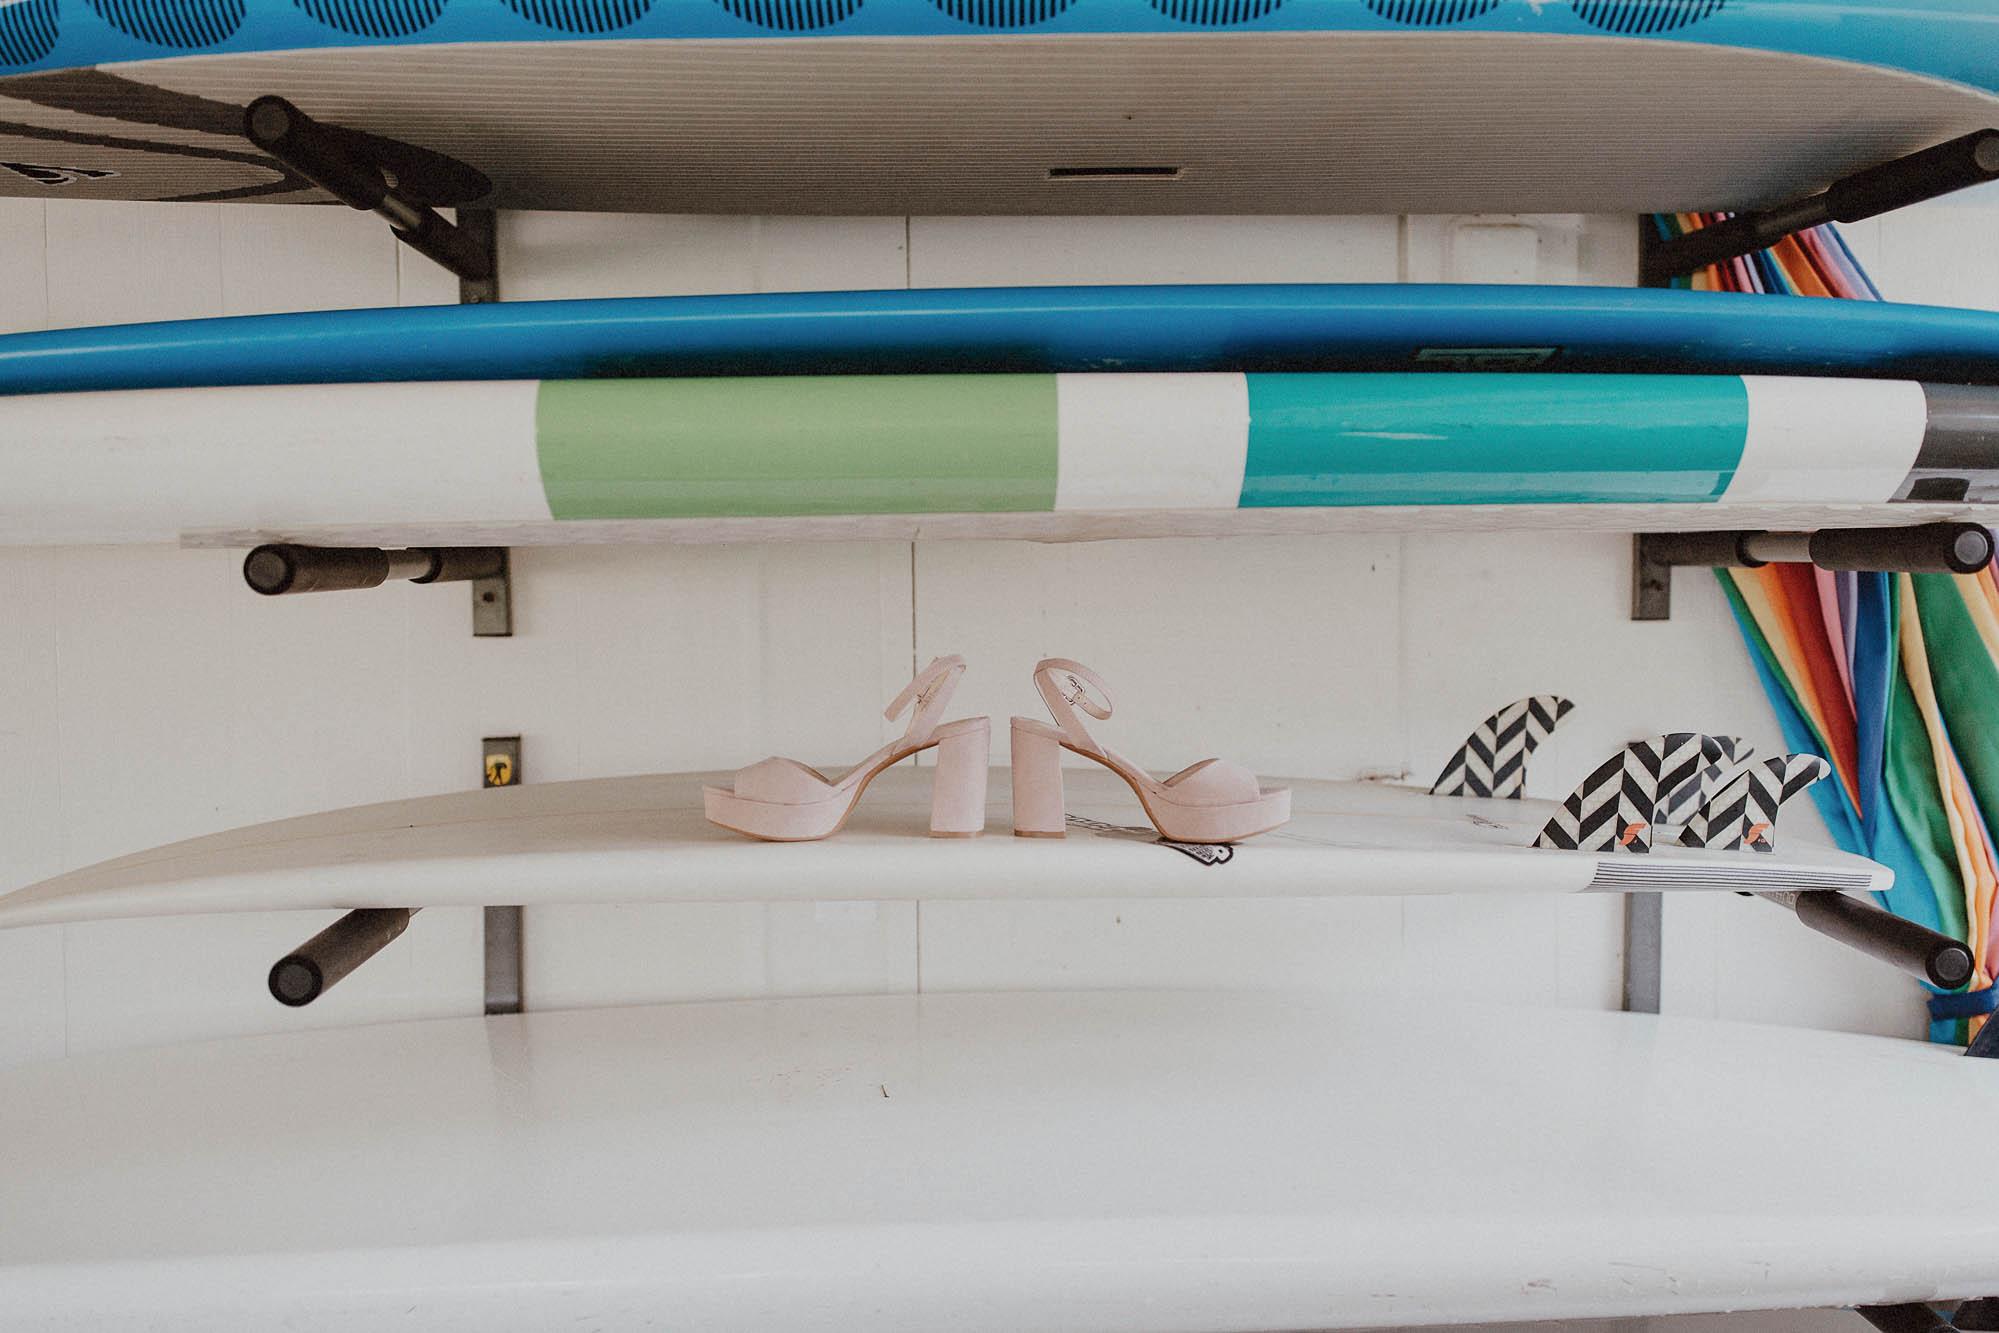 Blush wedding shoes on surfboard